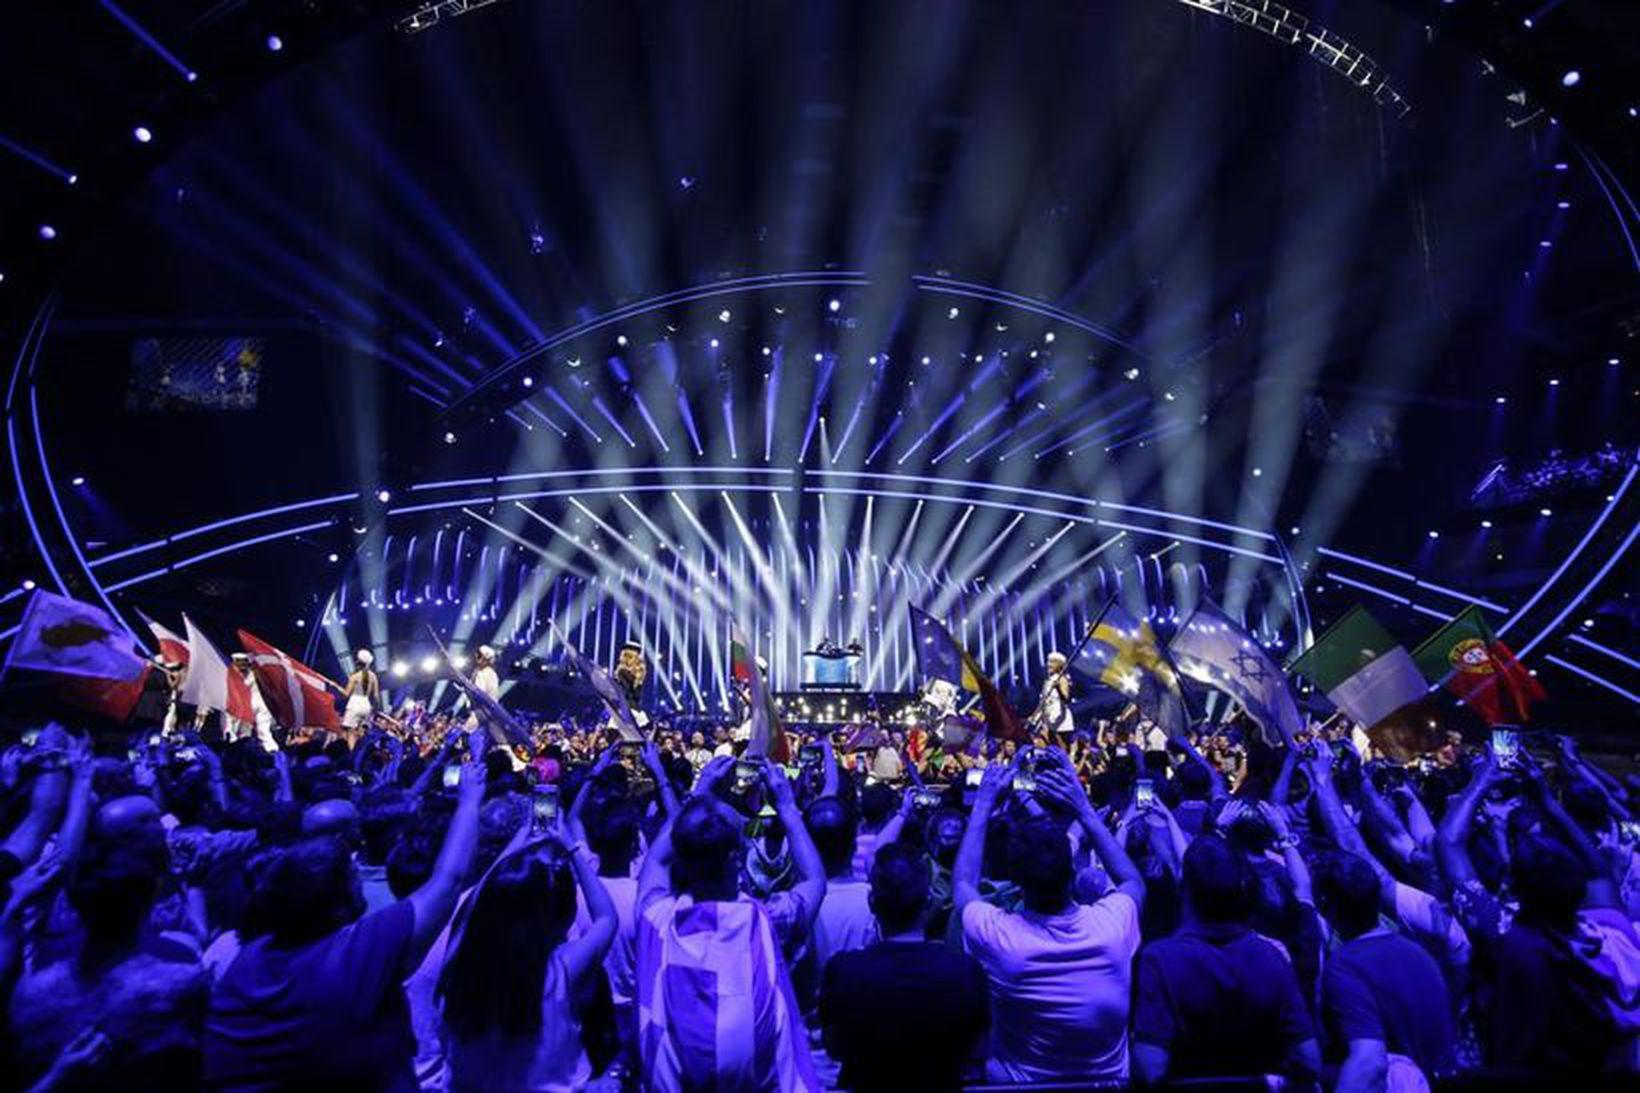 Eurovision-keppnin verður haldin í maí.